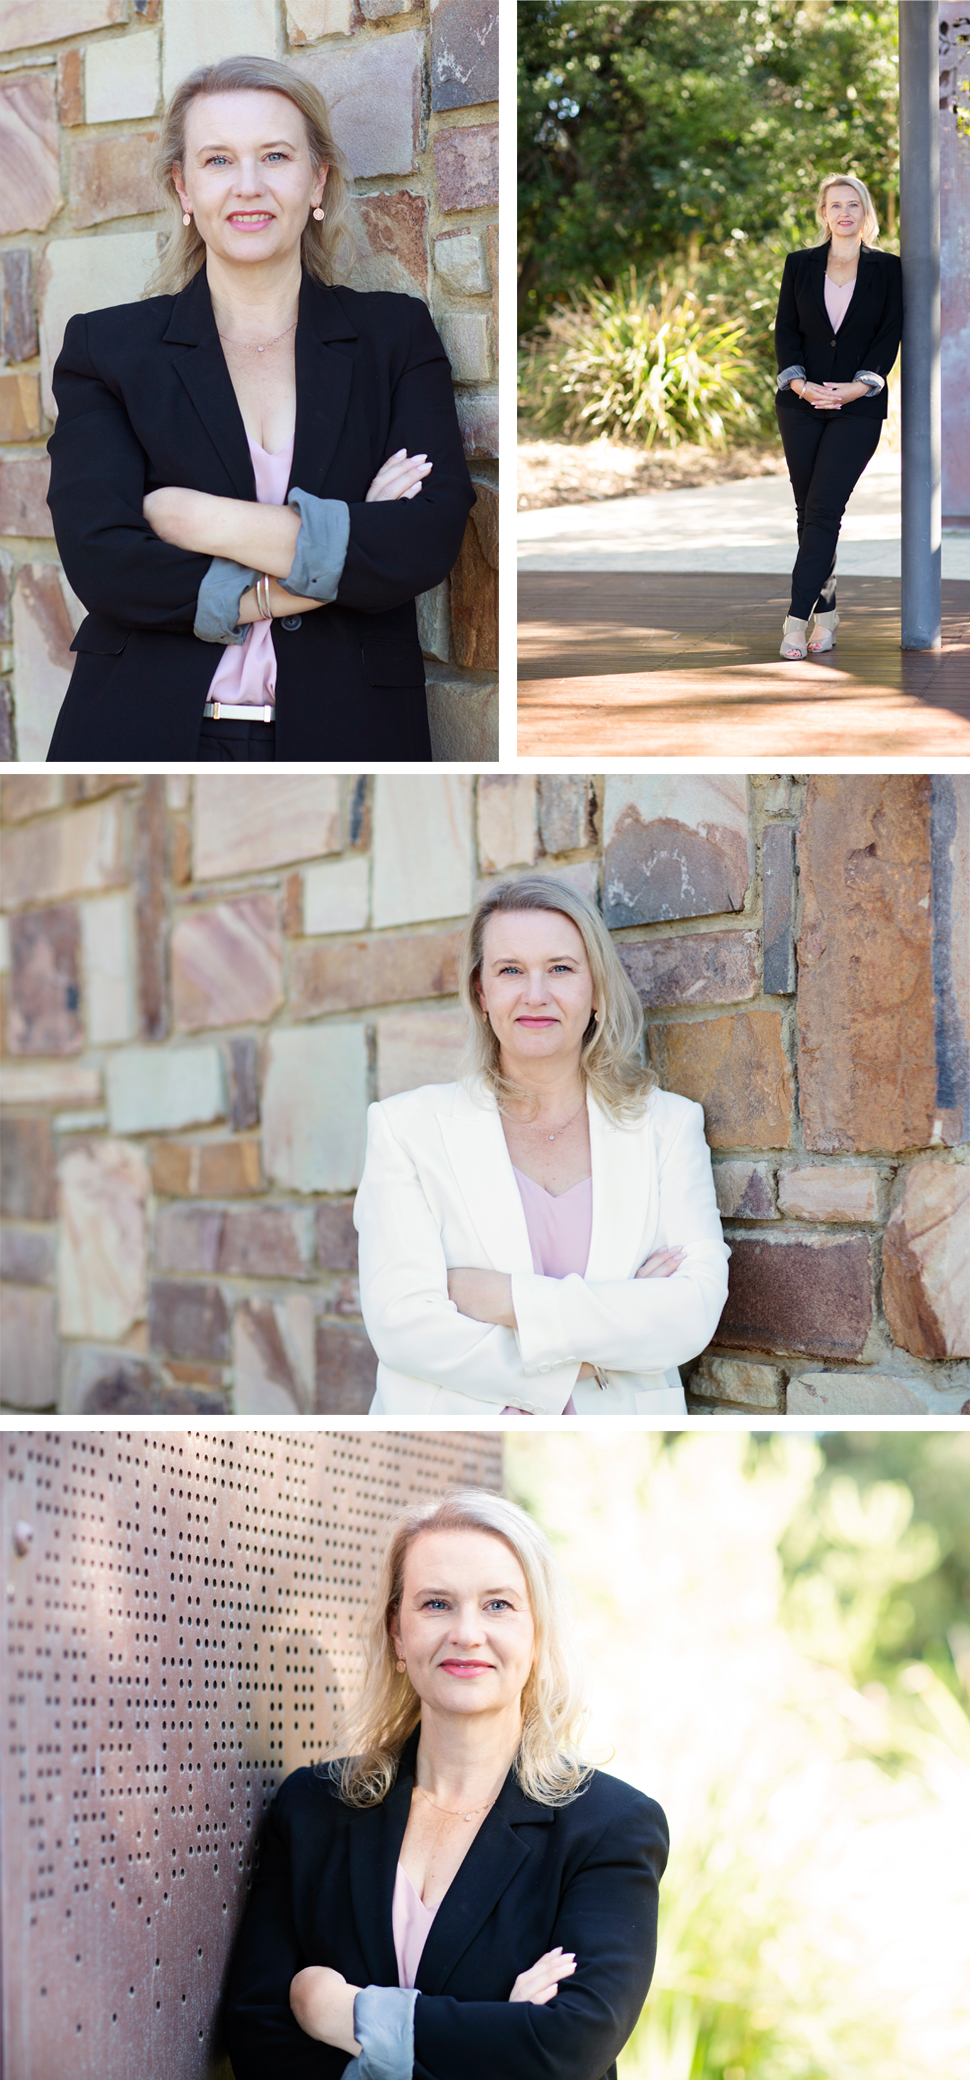 Corporate portraits on location